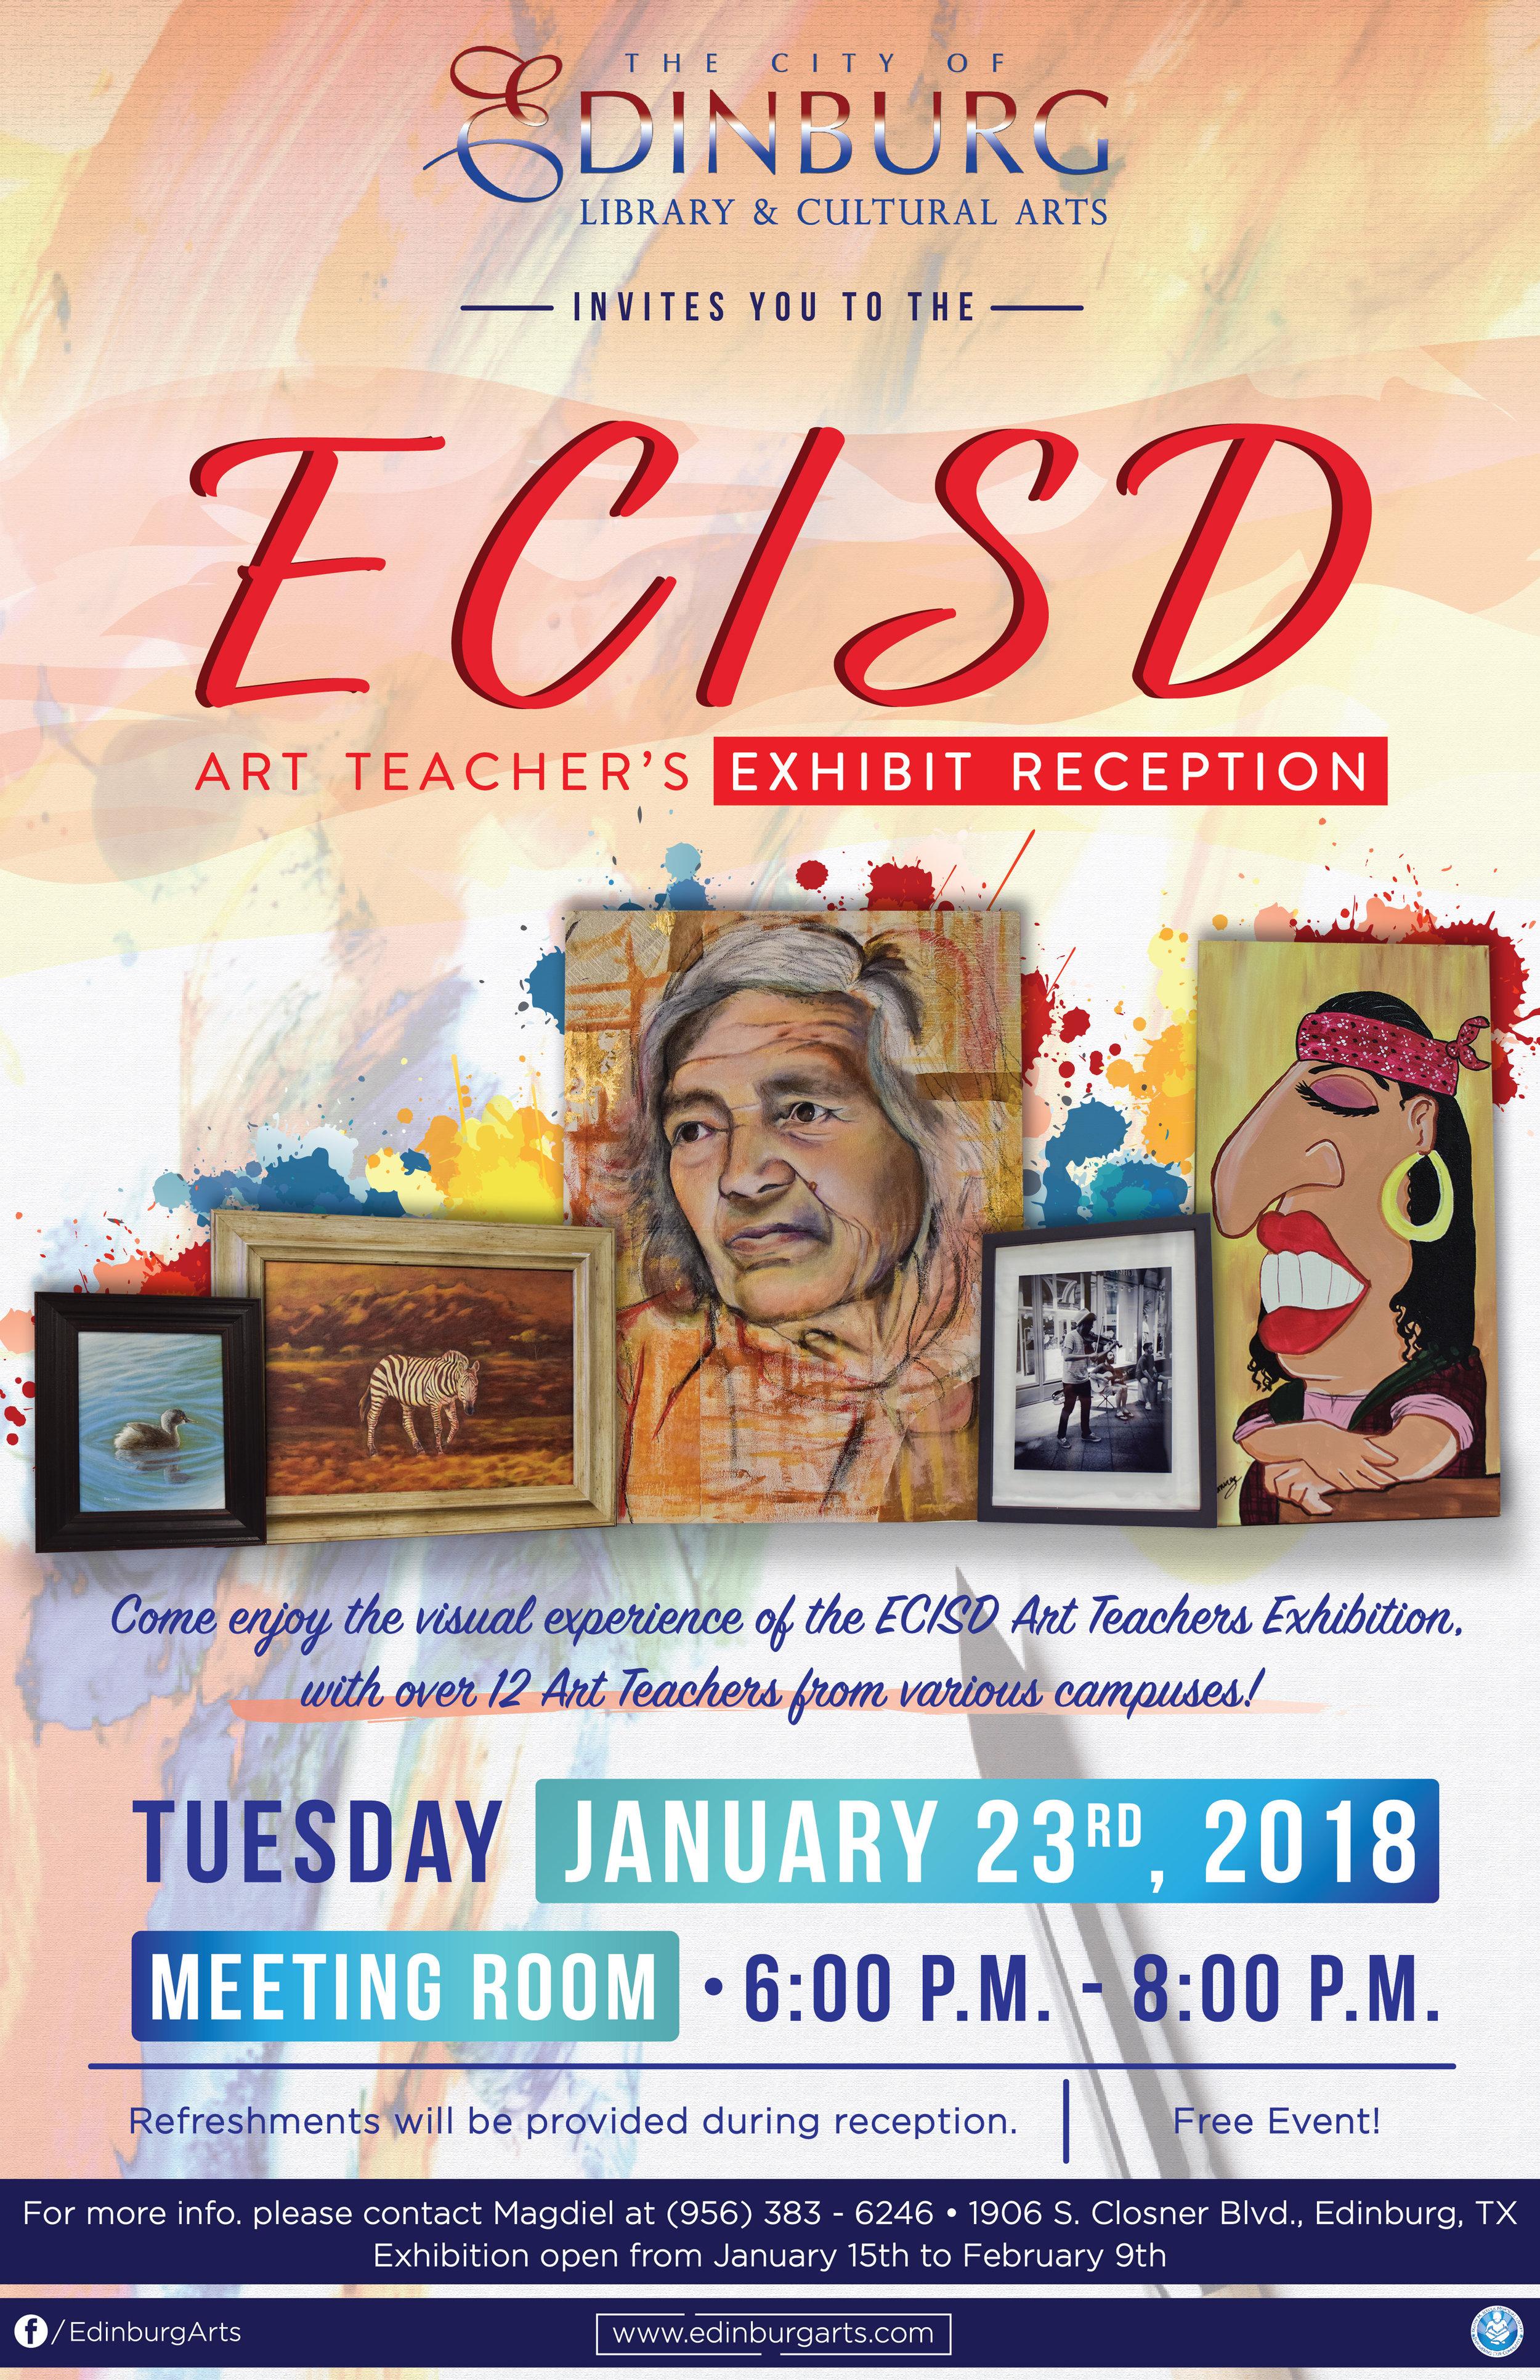 ECISD Teachers Exhibit Flyer.jpg